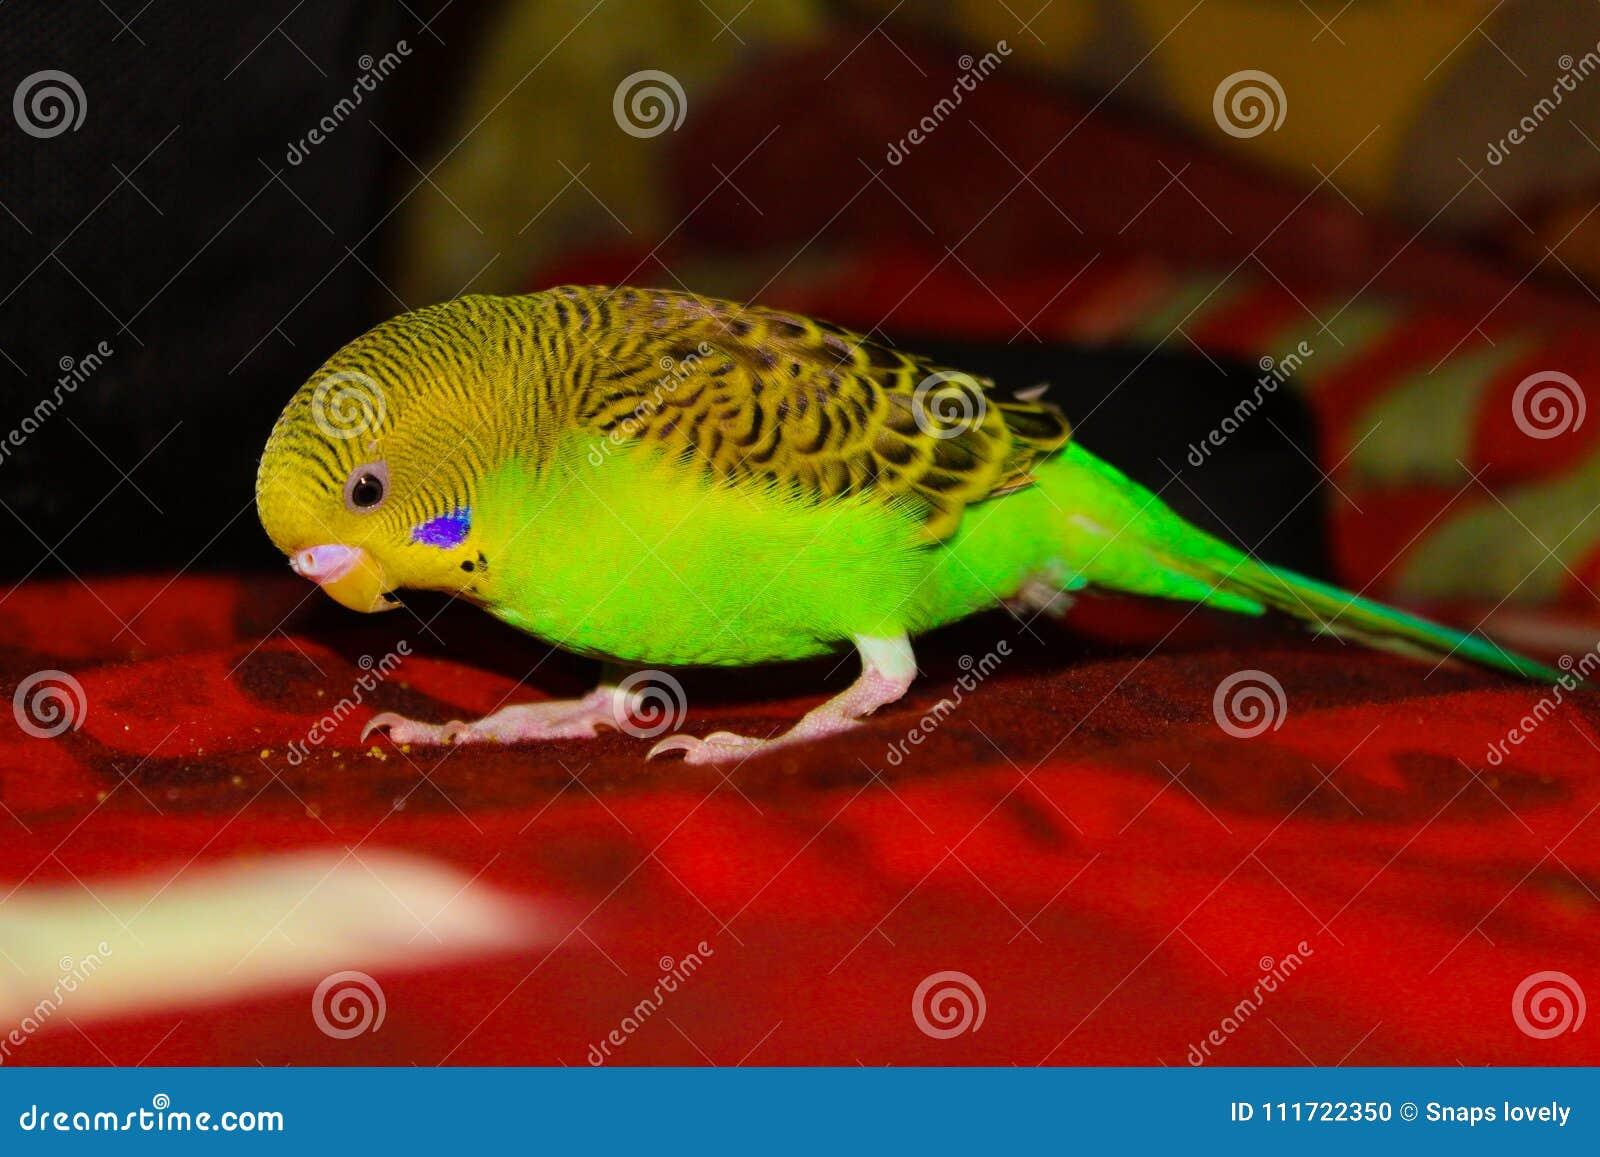 Lovebird Beautiful Green And Yellow Lovebird Stock Photo Image Of Bird Animals 111722350